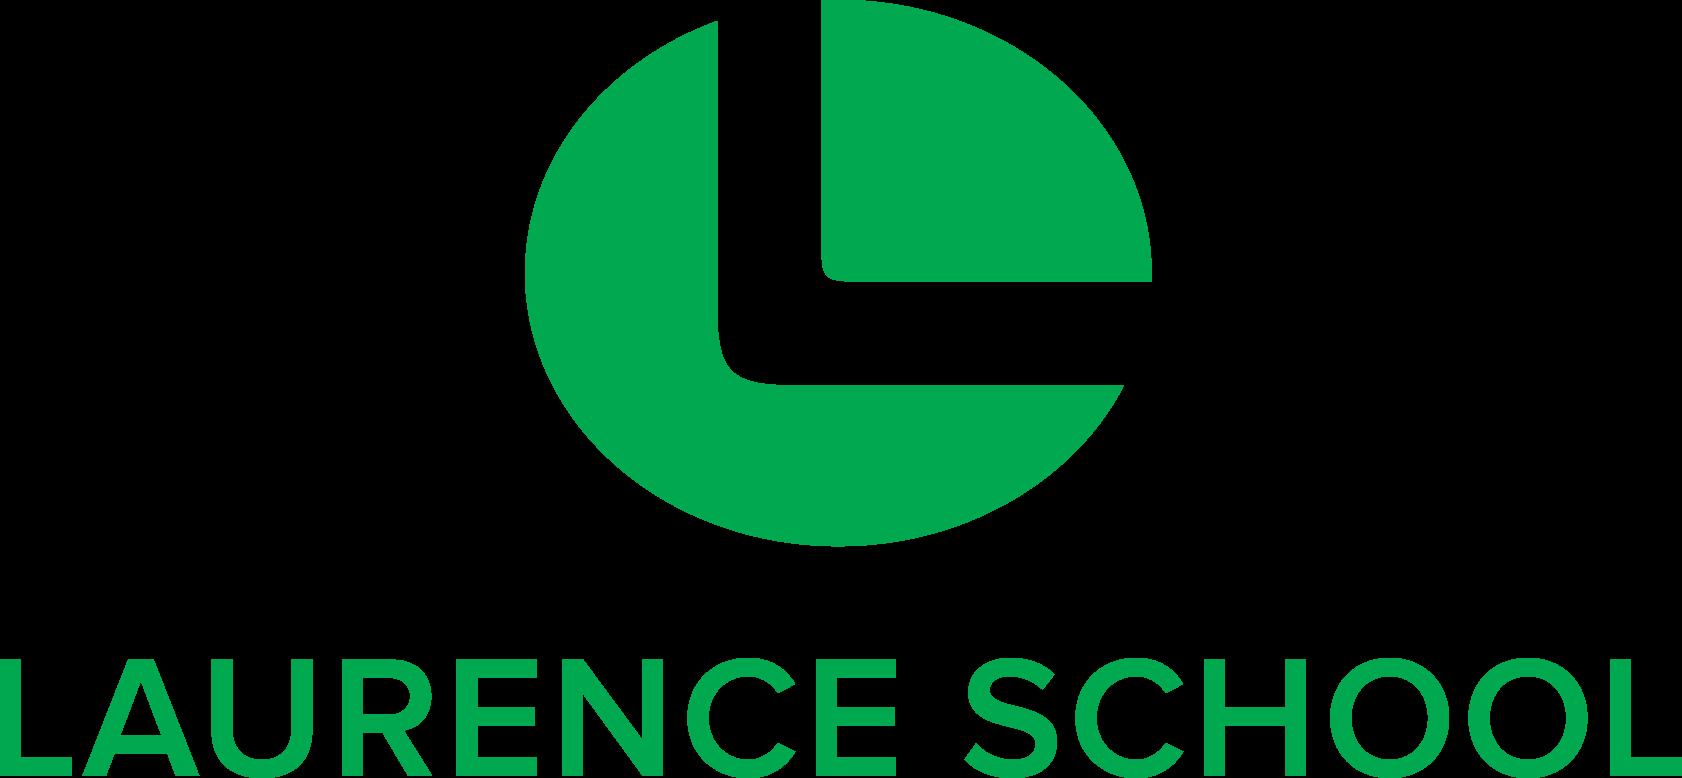 Digital Signage - Laurence School